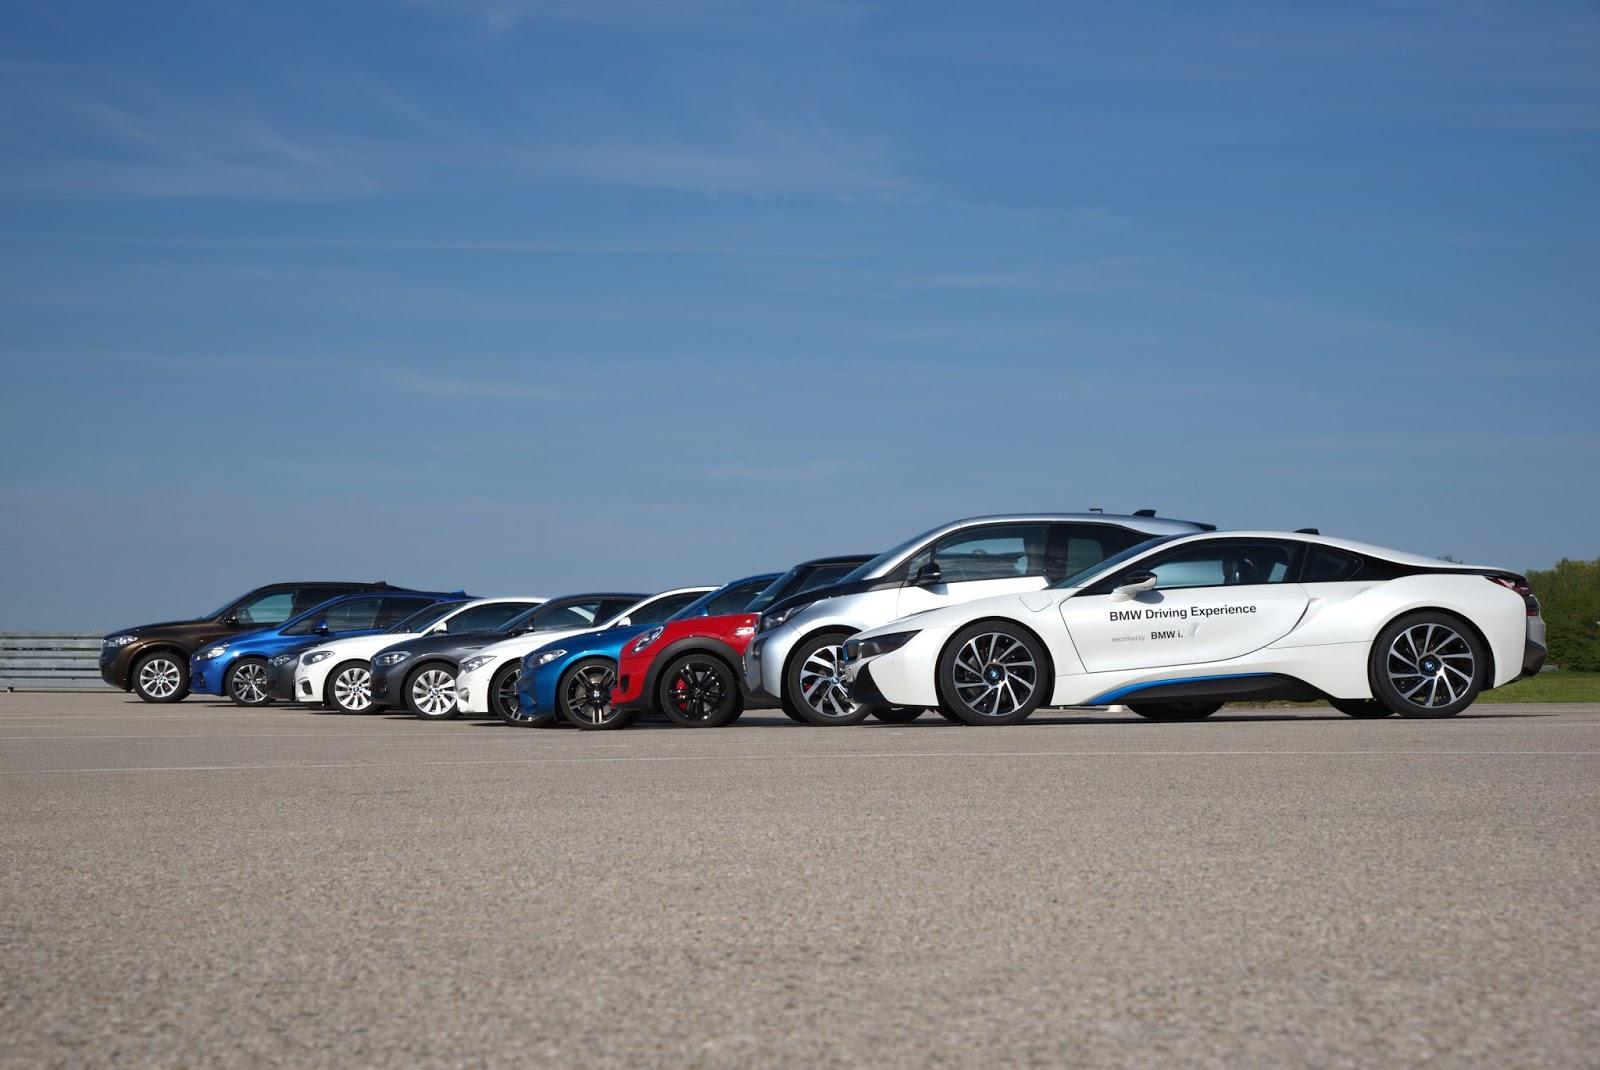 P90254193 highRes bmw mini driving ex 1 Γίνε καλύτερος οδηγός κάτω από όλες τις συνθήκες, με Bmw και Mini BMW, BMW i, BMW M, Driver, Driving Skills, Safety, οδήγηση, οδηγοί